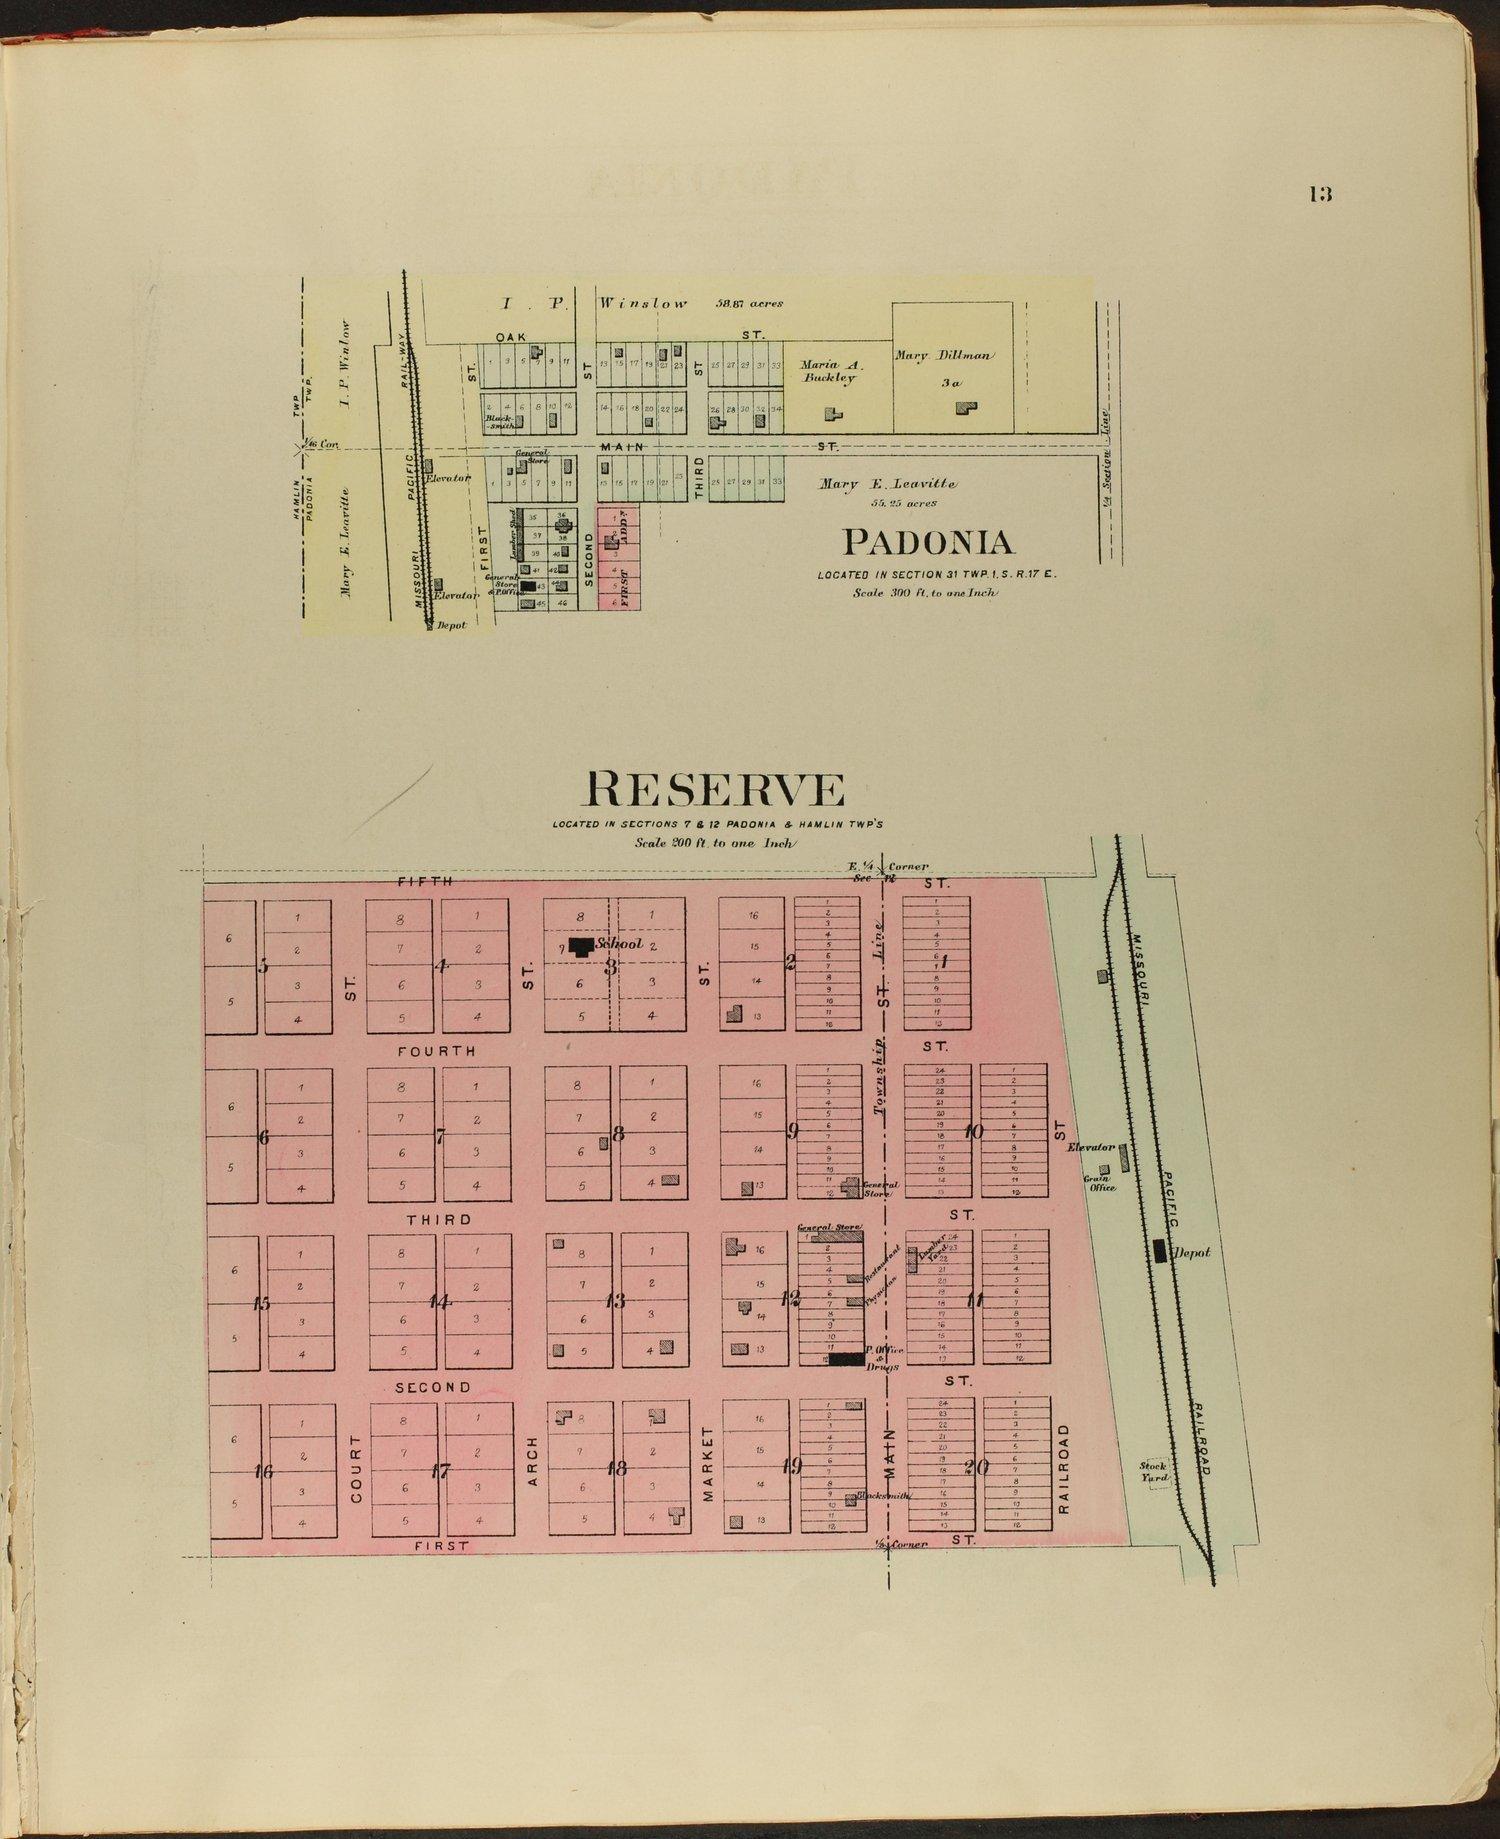 Meacham's illustrated atlas of Brown and Nemaha counties, Kansas - 13